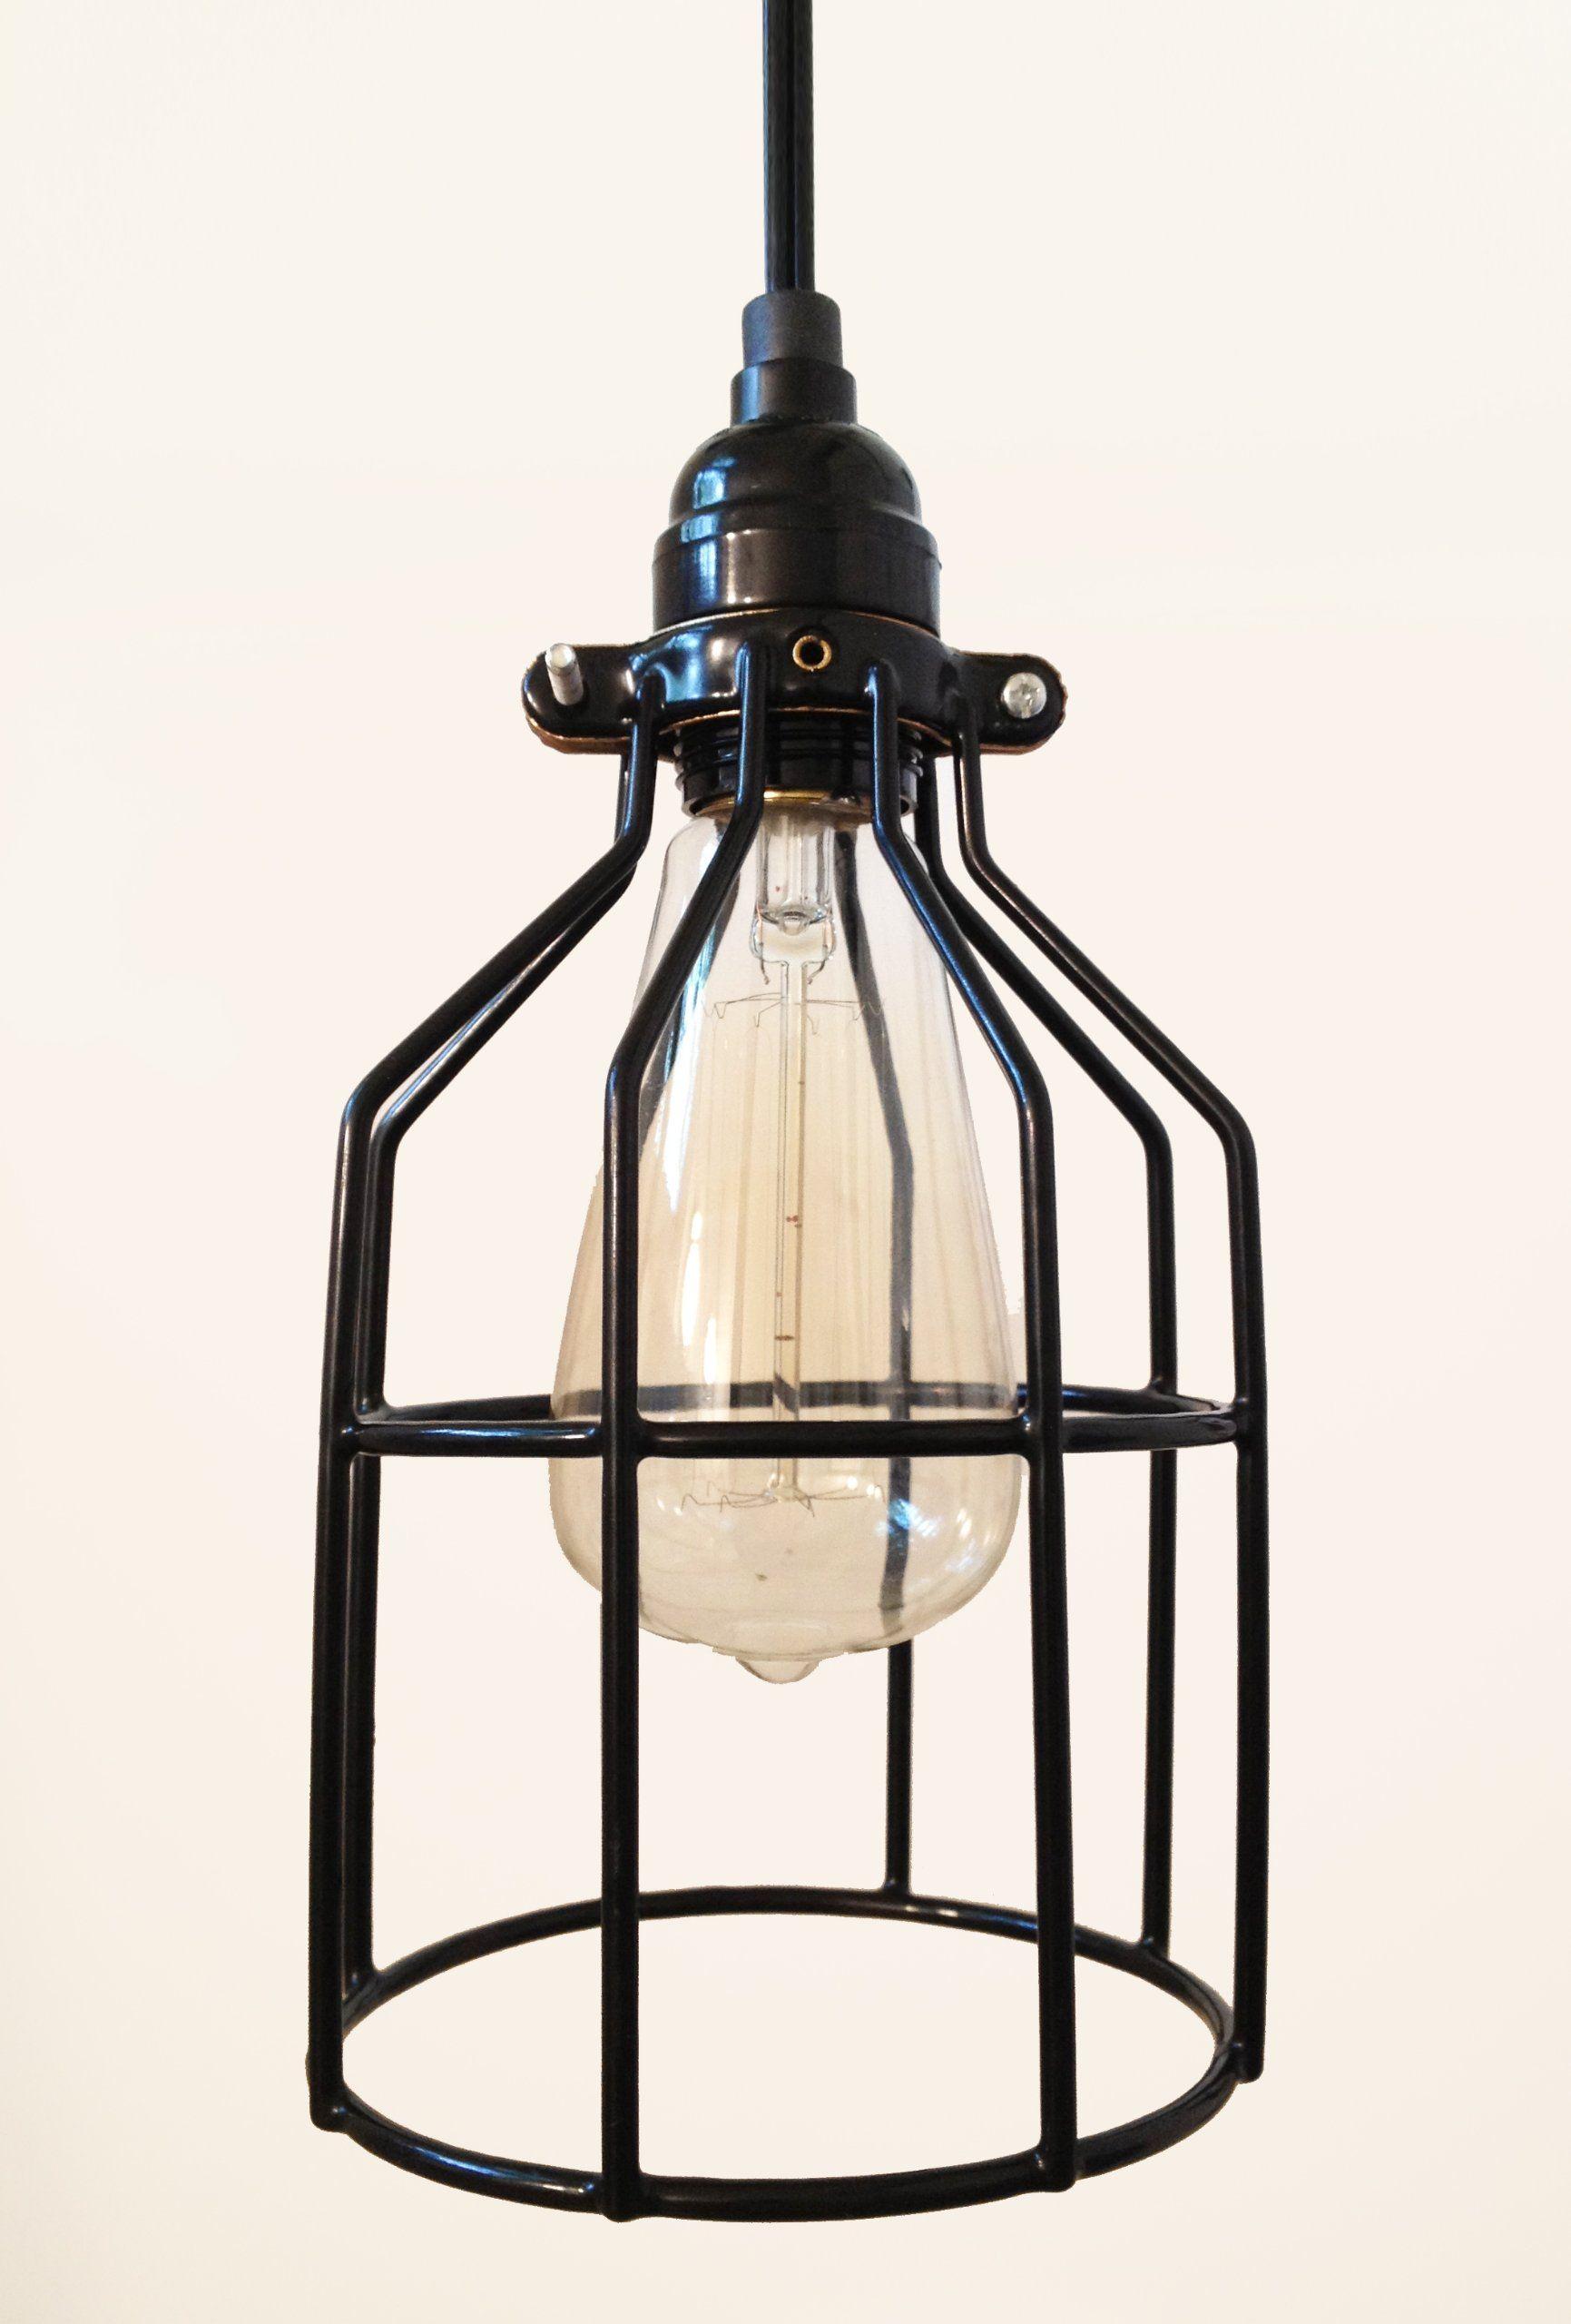 plug in industrial lighting. Tesla I Industrial Cage Pendant Lamp With Plug-in Cord | Amazon.com Plug In Lighting H